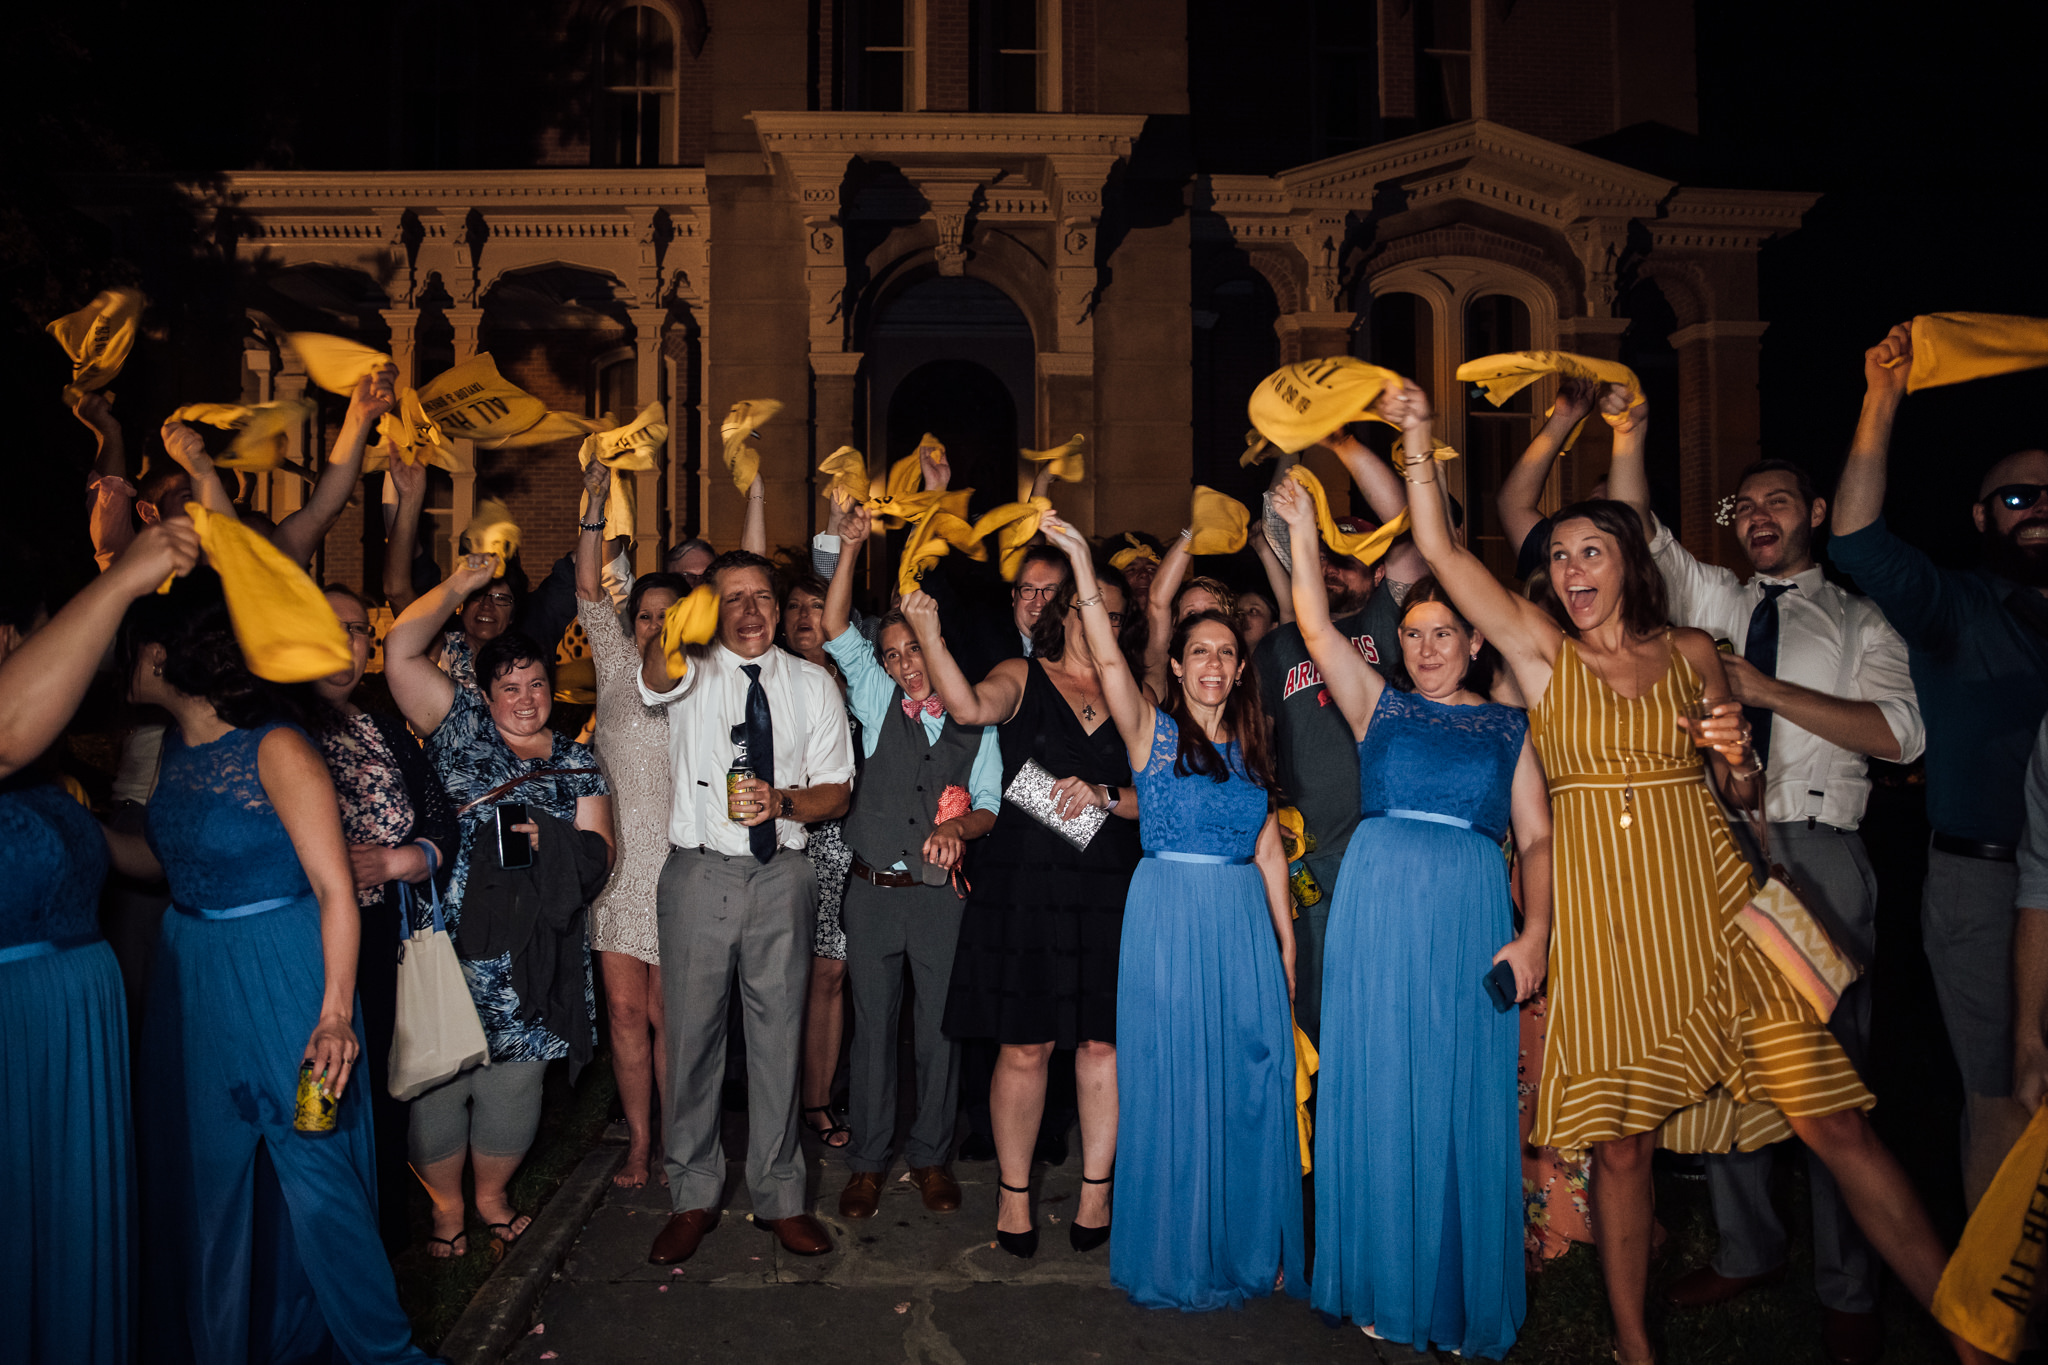 woodruff-fontaine-wedding-venue-memphis-thewarmtharoundyou-brenda-taylor-59.jpg